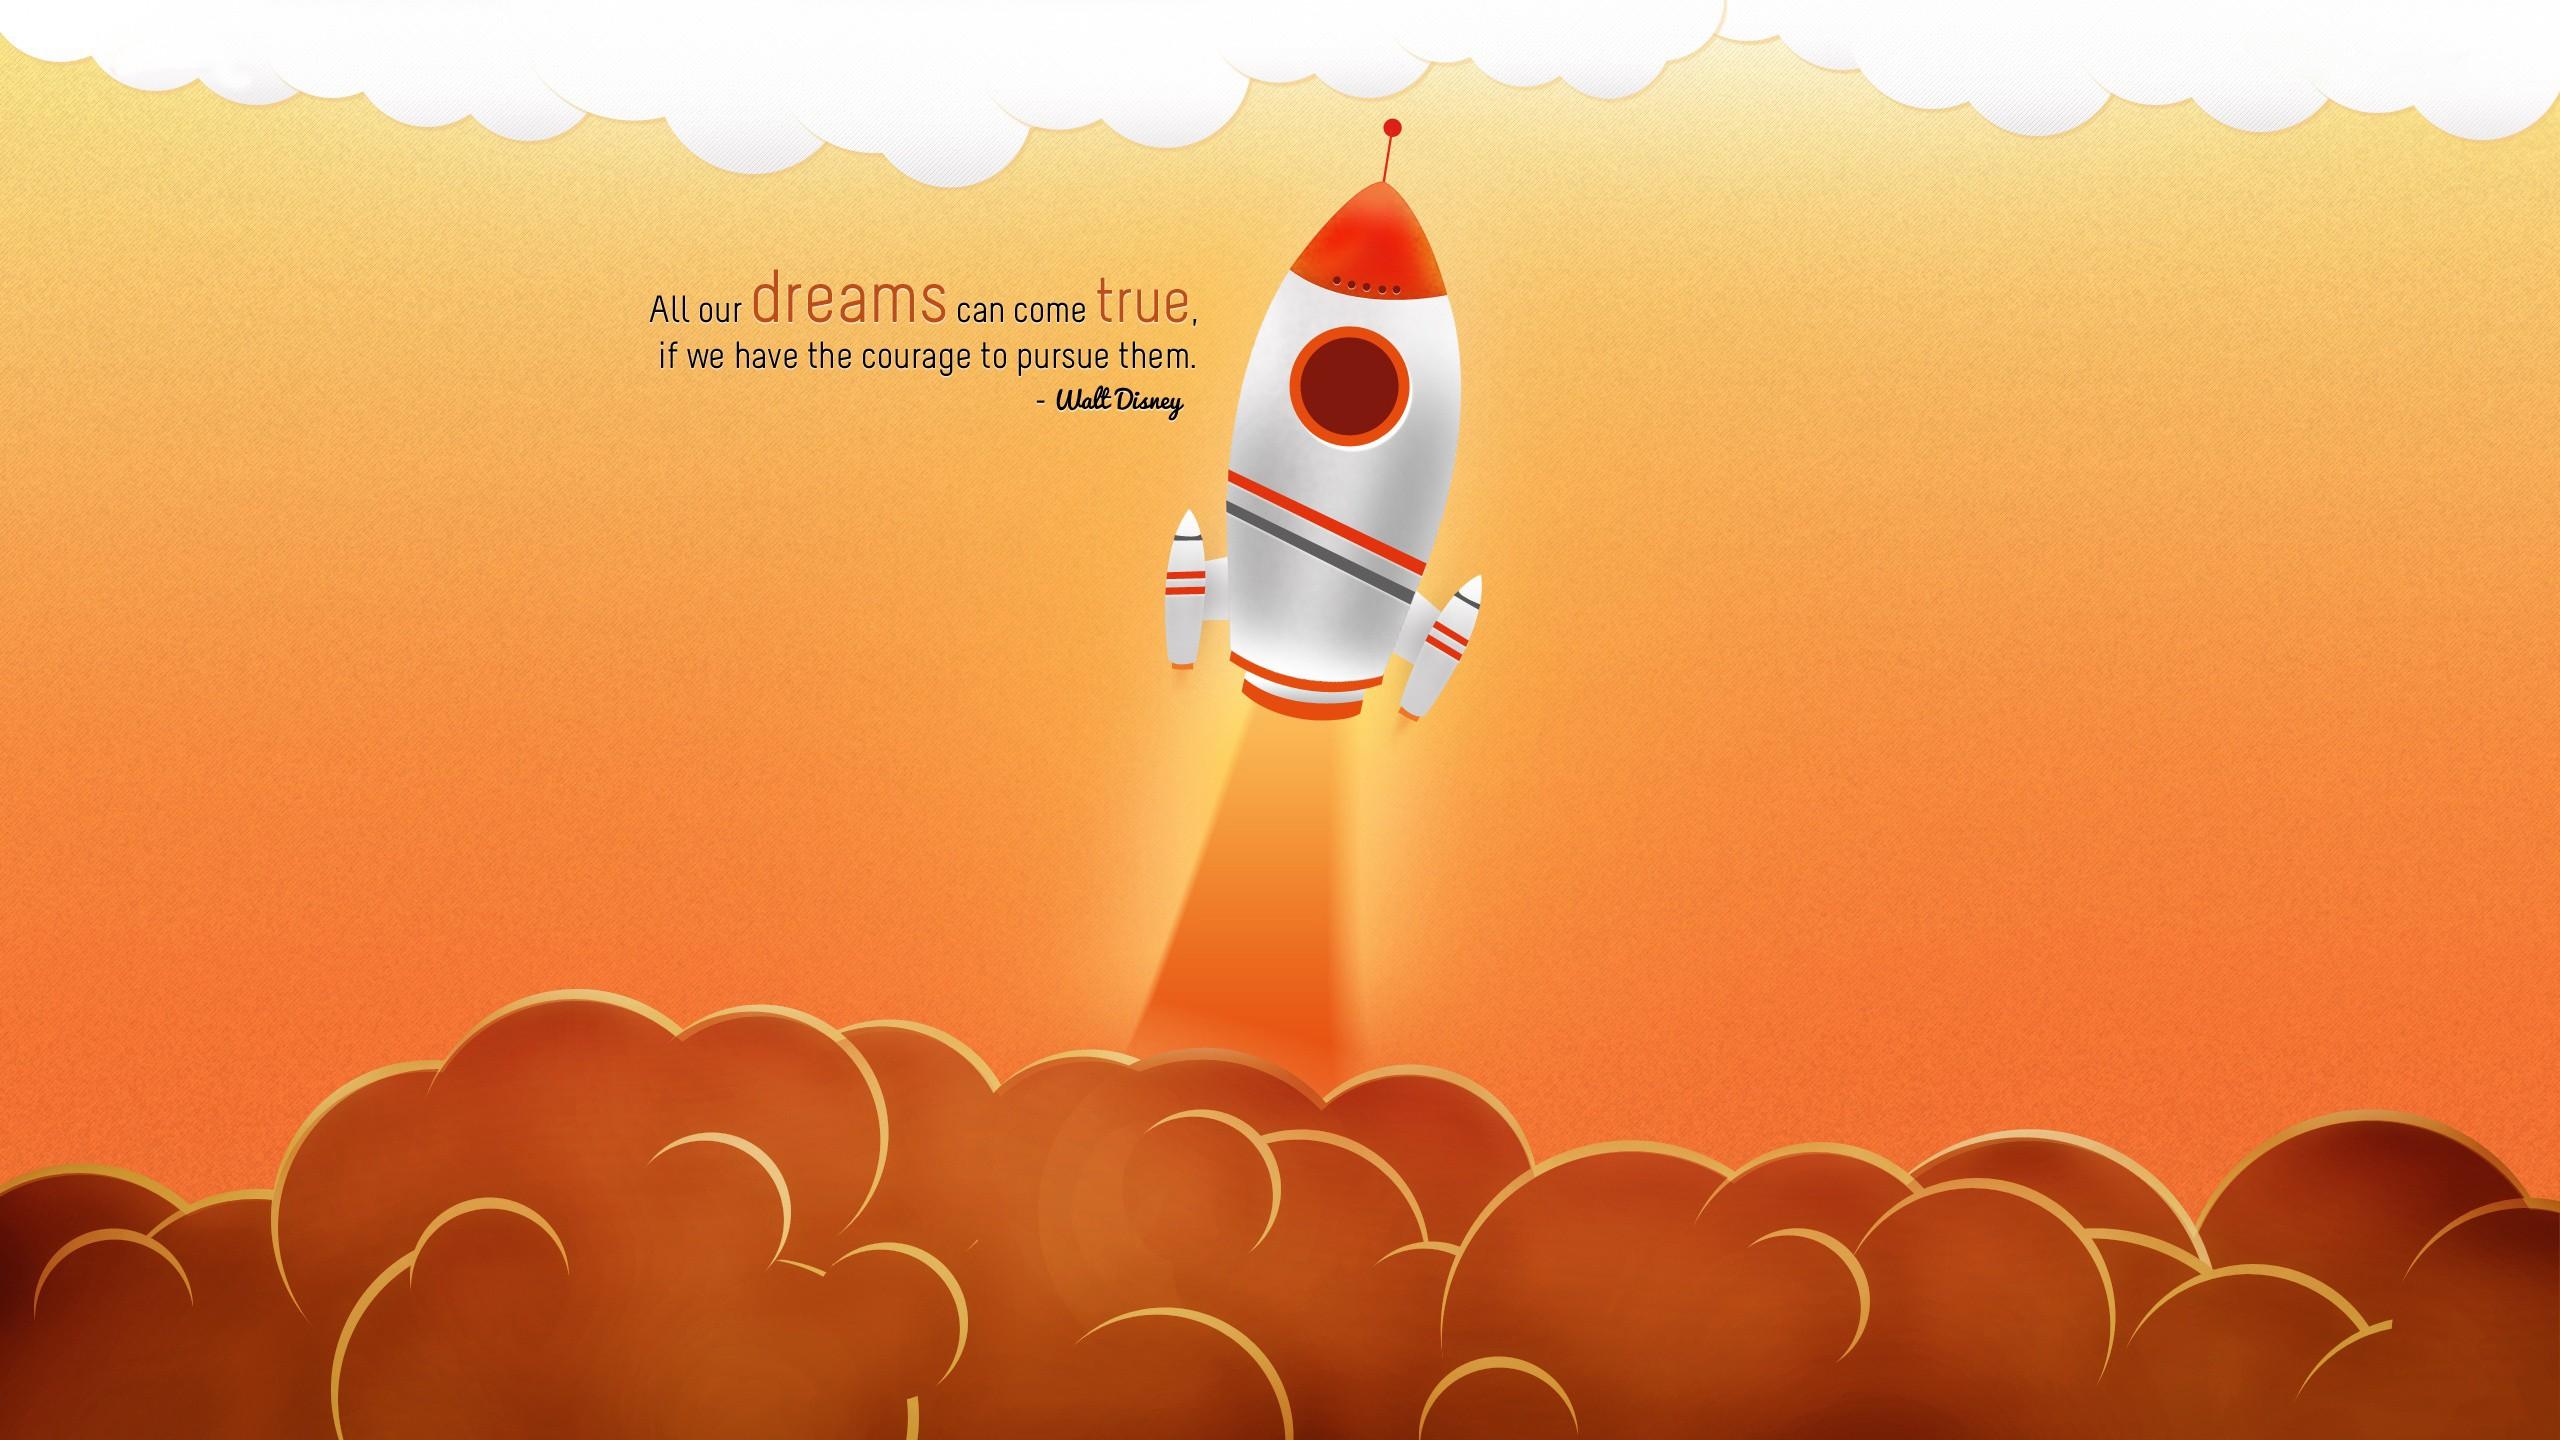 Rocket quote #3